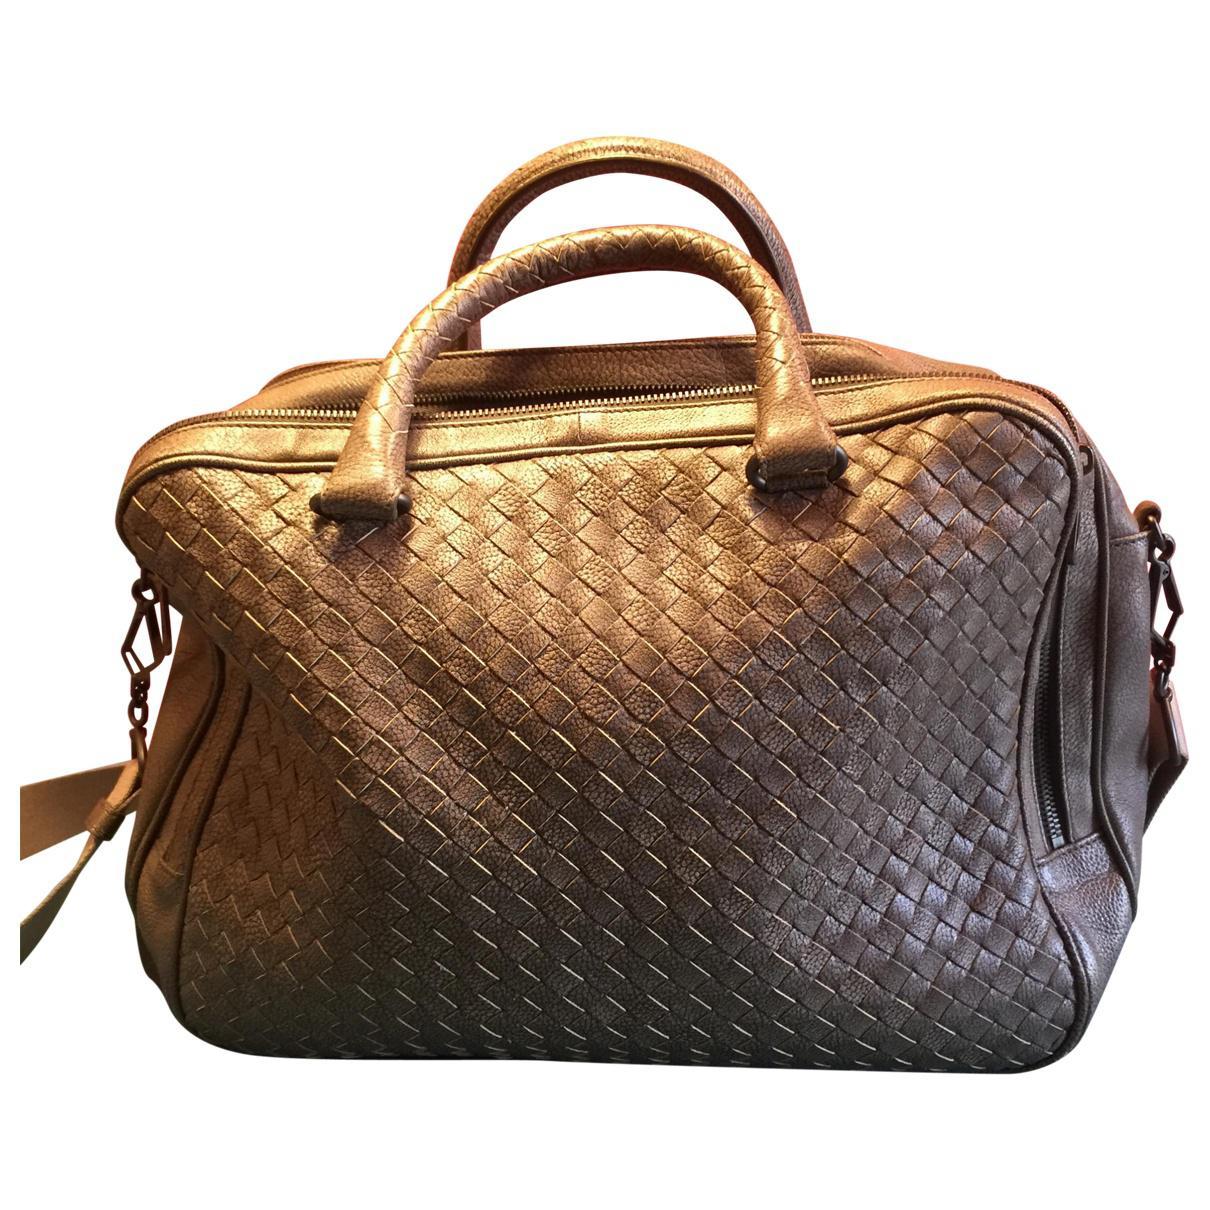 fb6bb53c6d30 Bottega Veneta. Women s Brown Leather Weekend Bag.  2